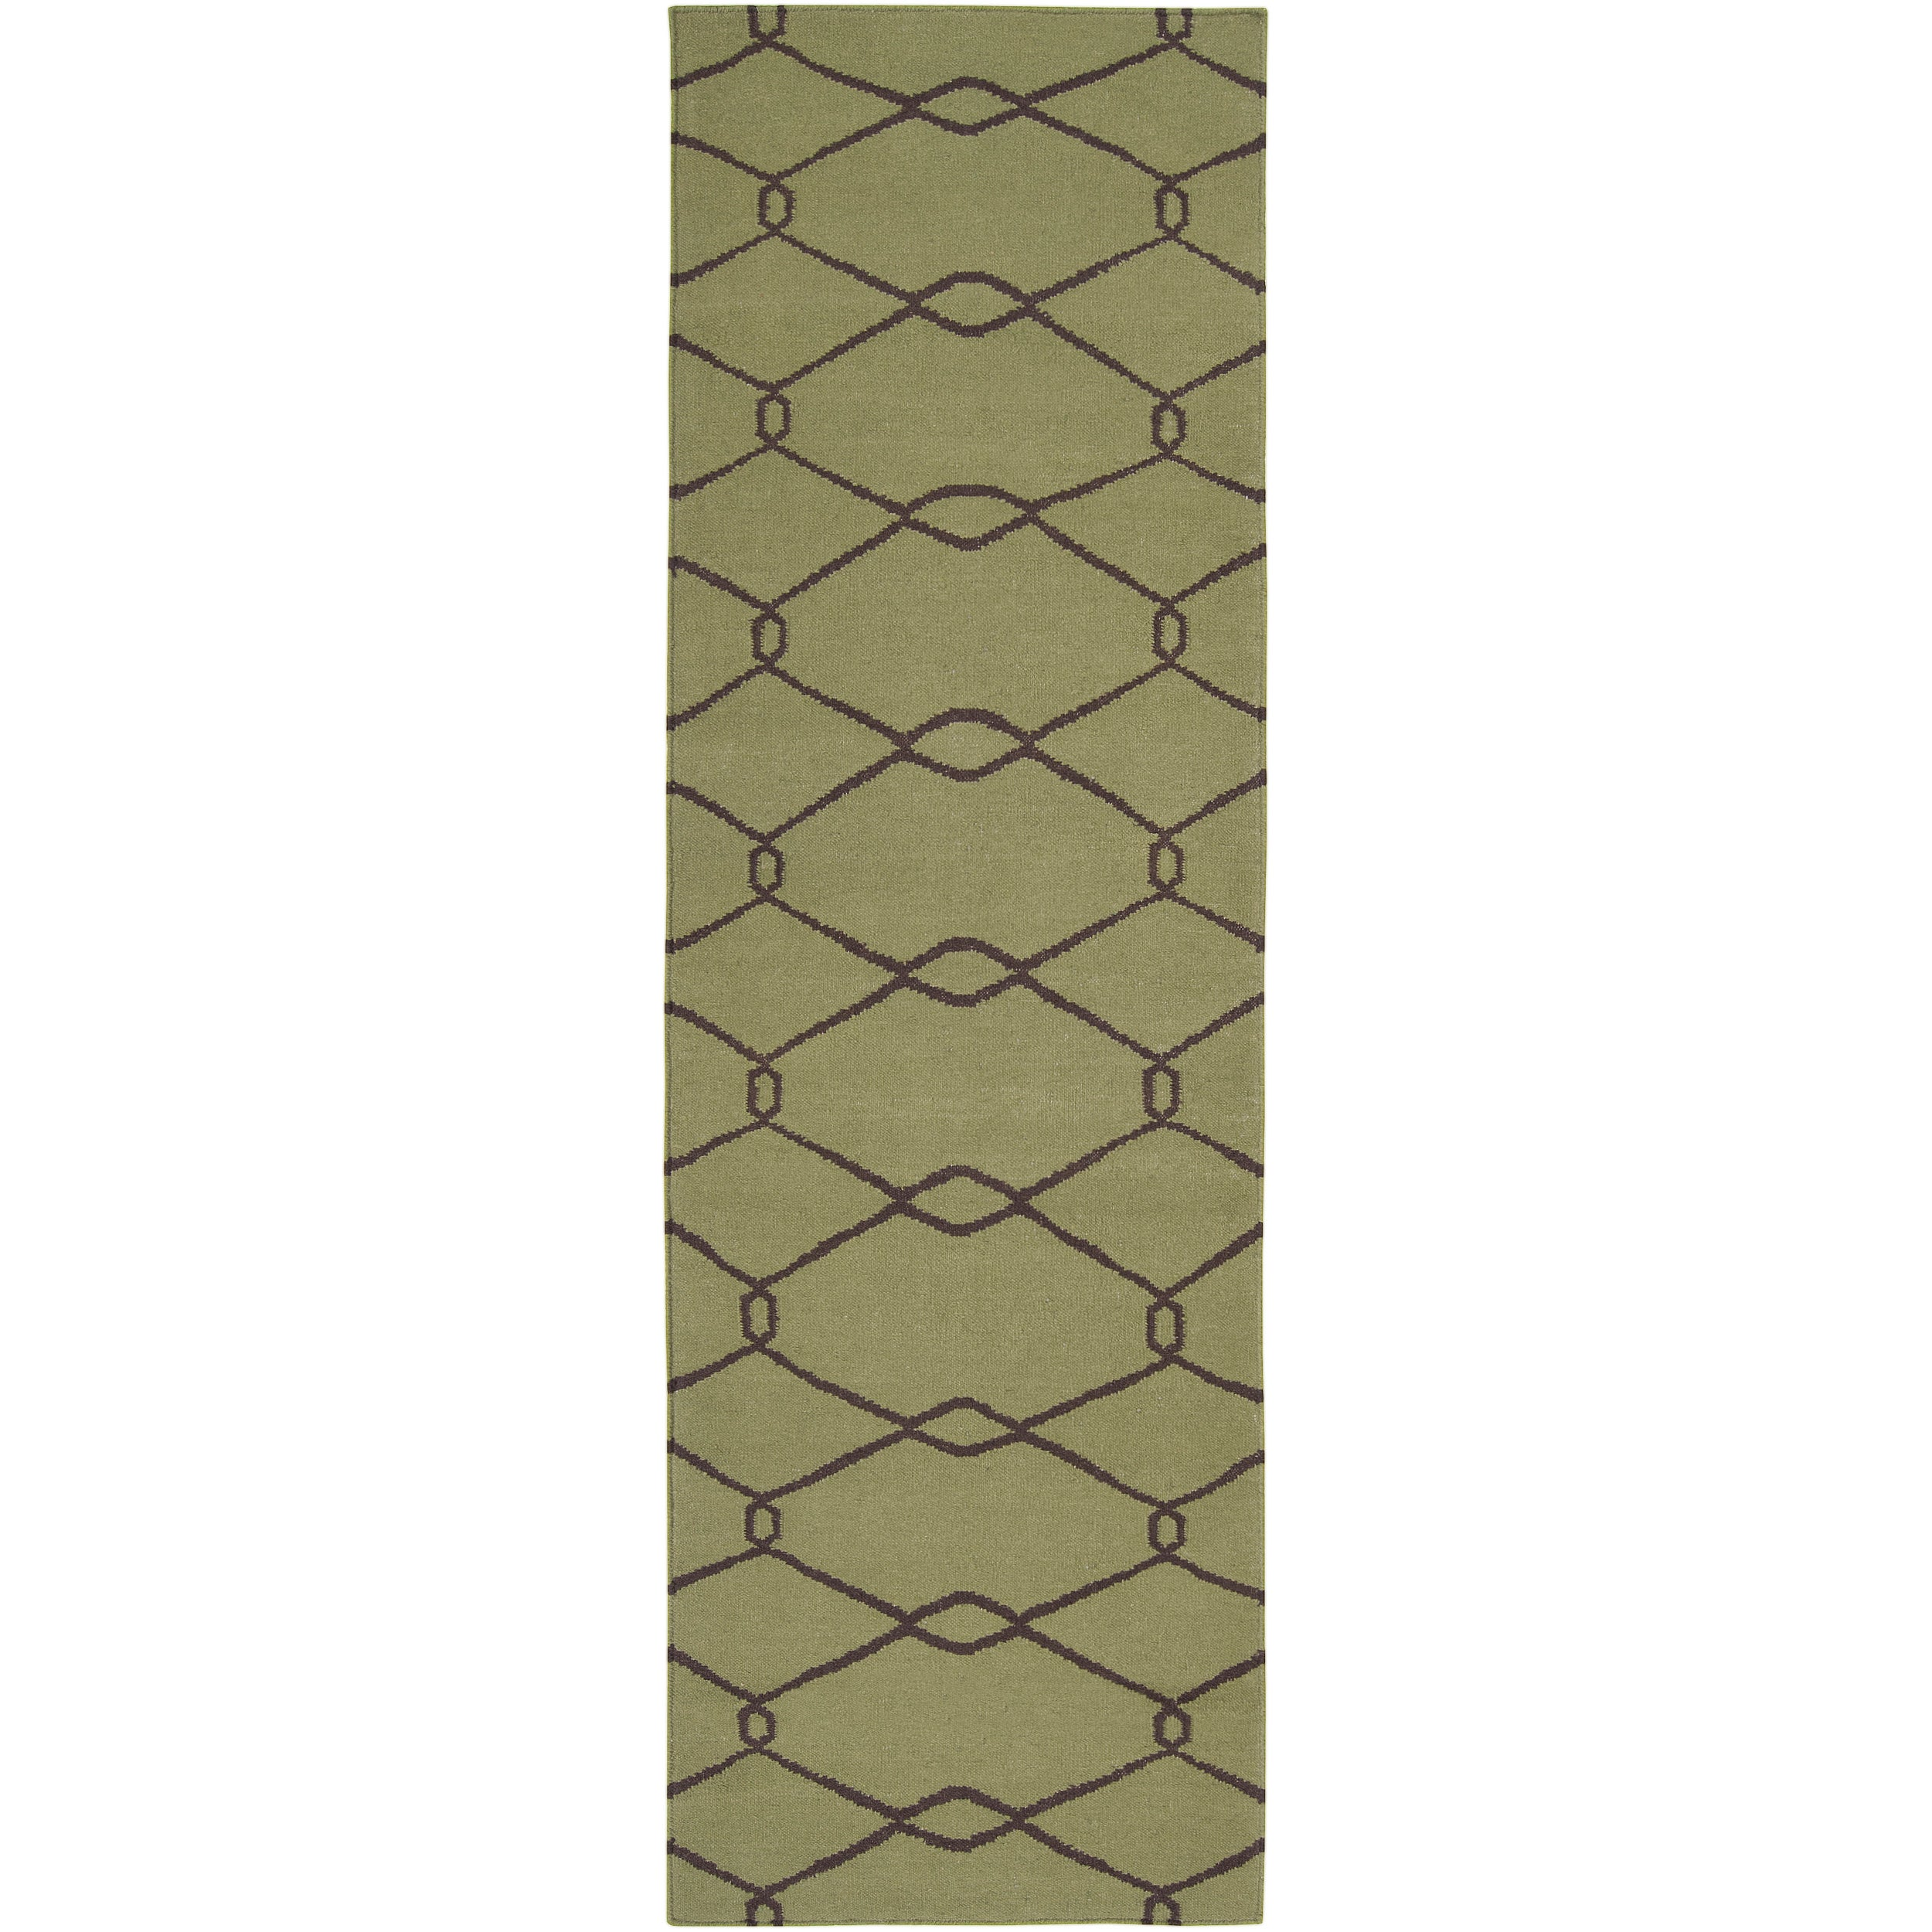 Jill Rosenwald Hand-woven Green Komel Wool Rug (2'6 x 8')